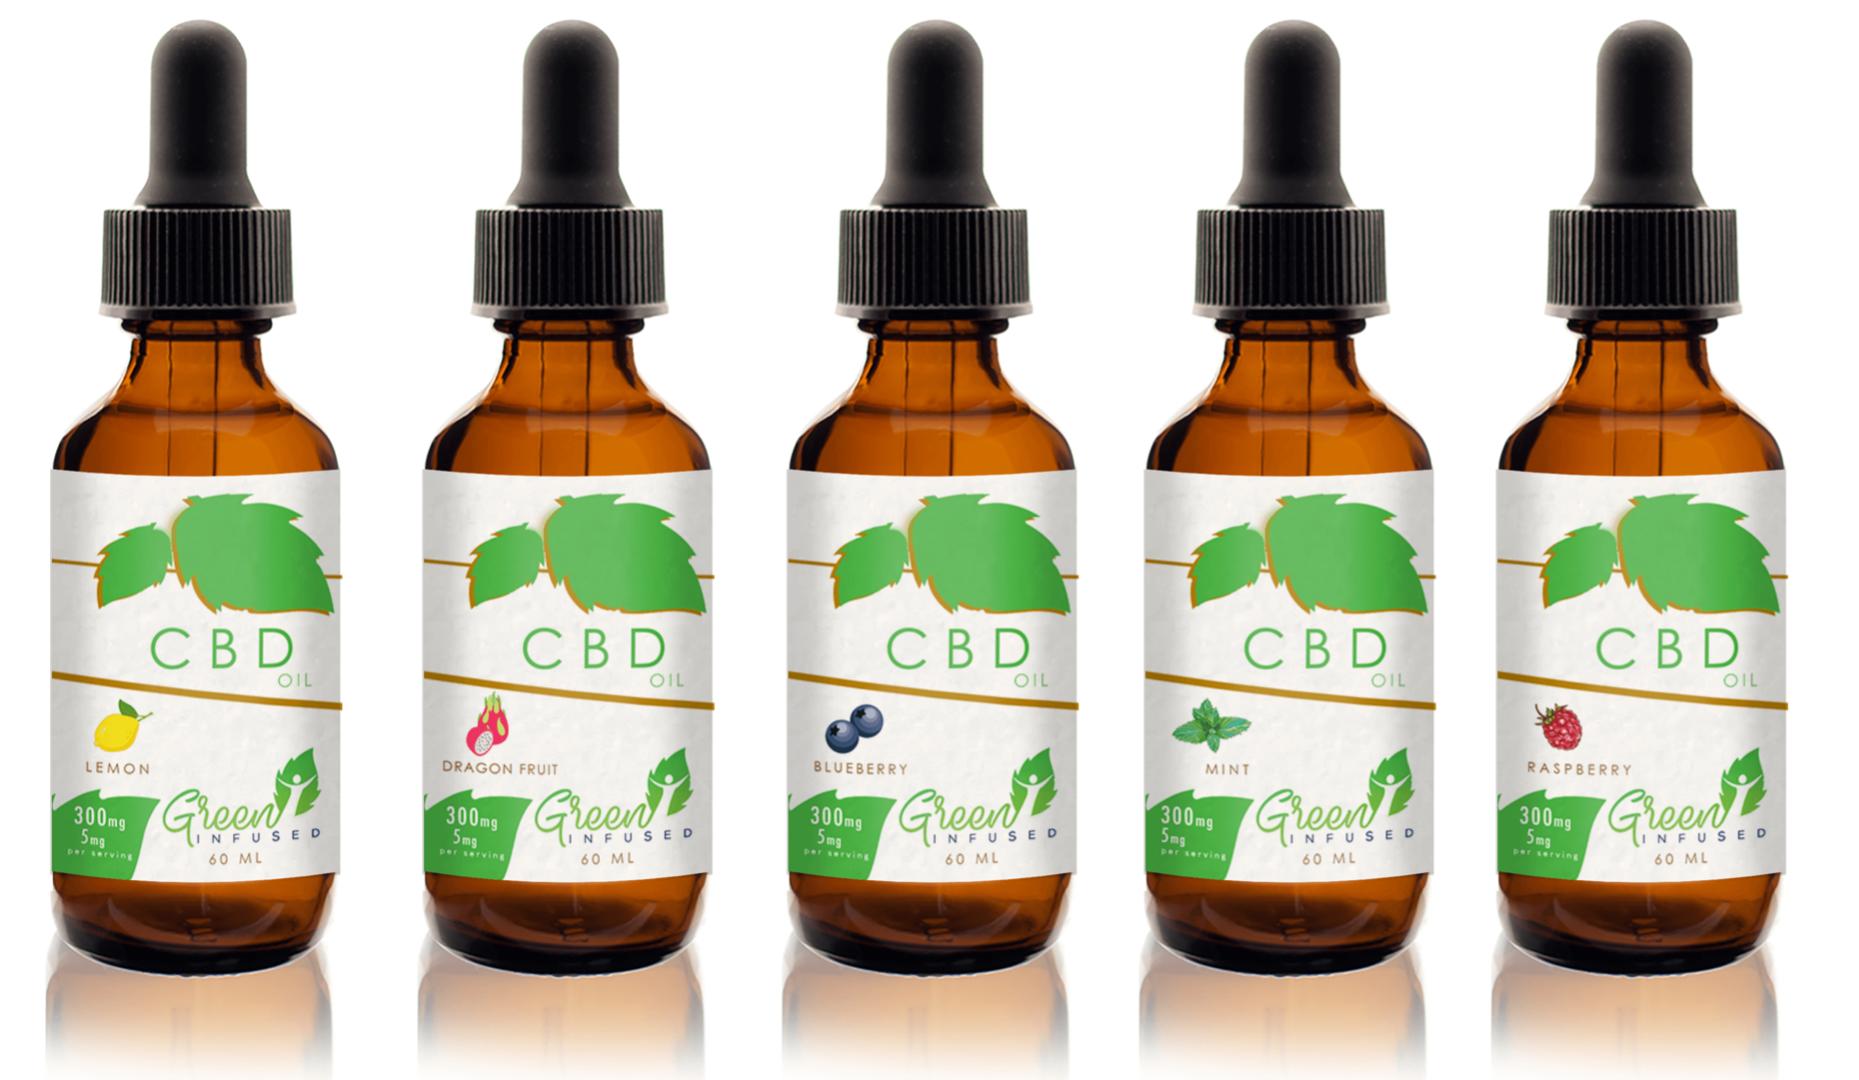 6 Flavors of CBD Oil